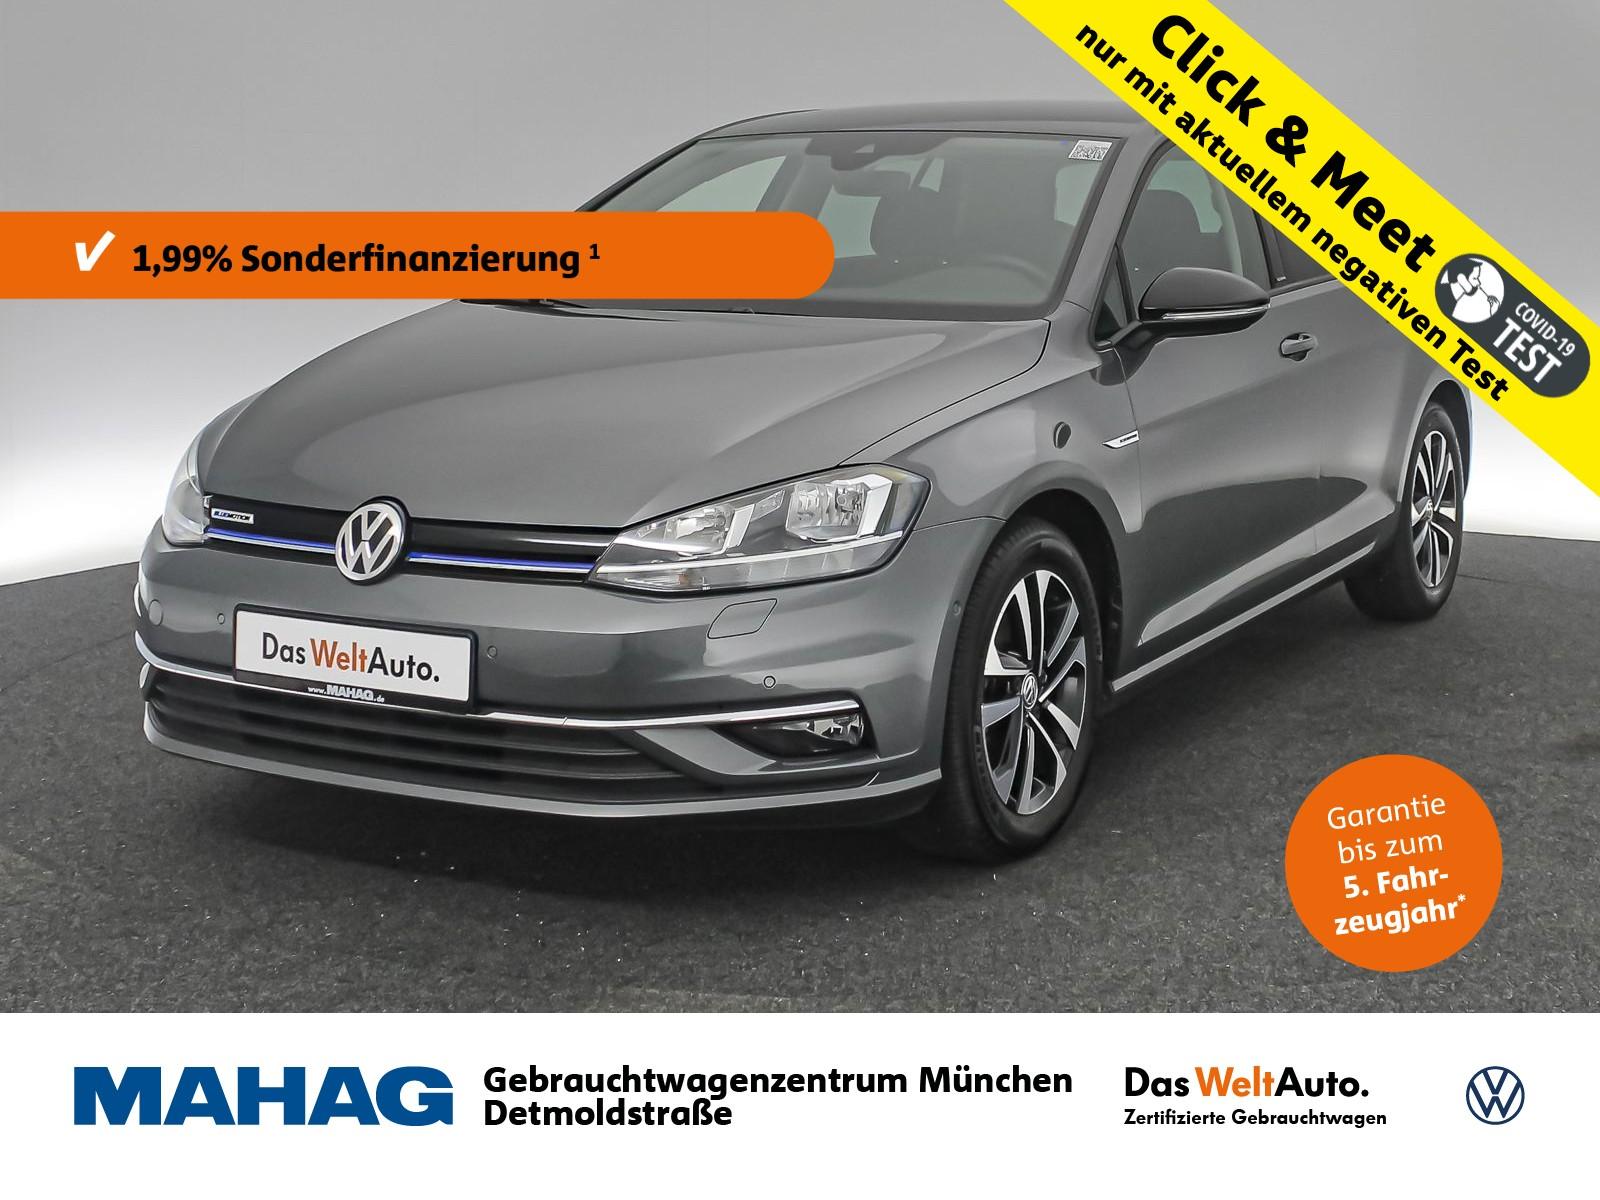 Volkswagen Golf VII 1.5 TSI ACT IQ.DRIVE Navi ParkLenkAssist Bluetooth 16Zoll 6-Gang, Jahr 2020, Benzin